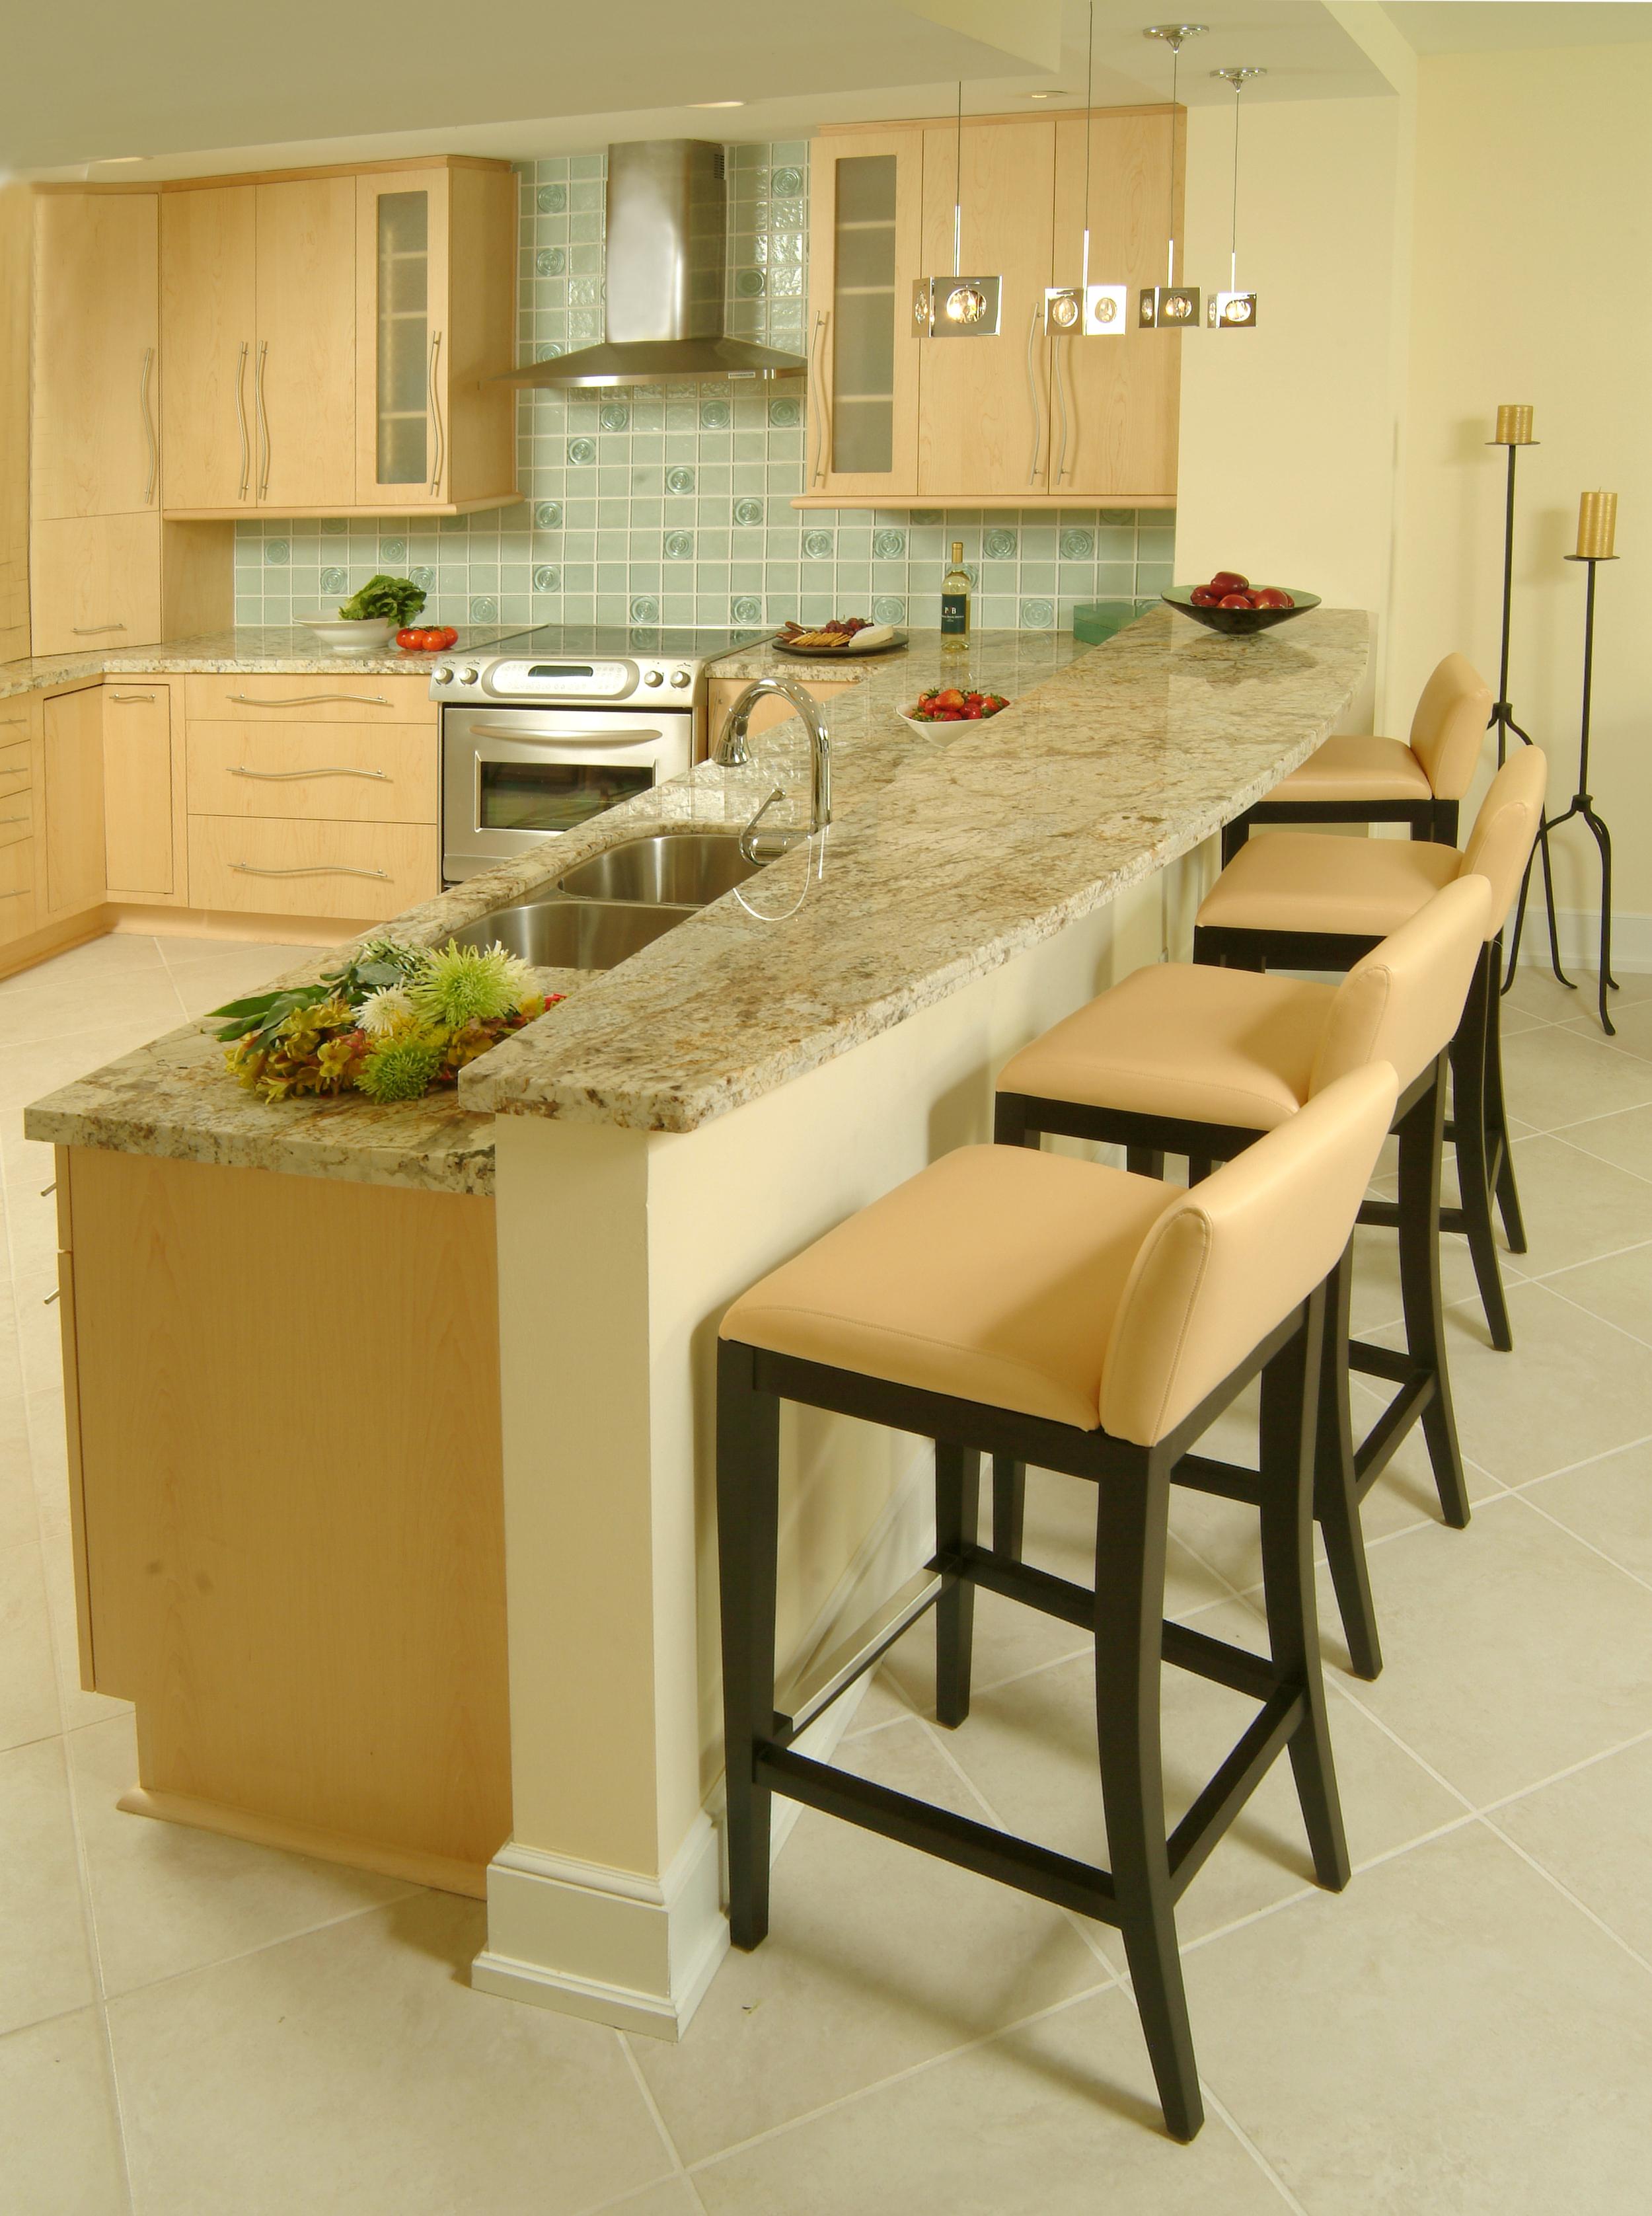 Sea Quay Kitchen 2.jpg